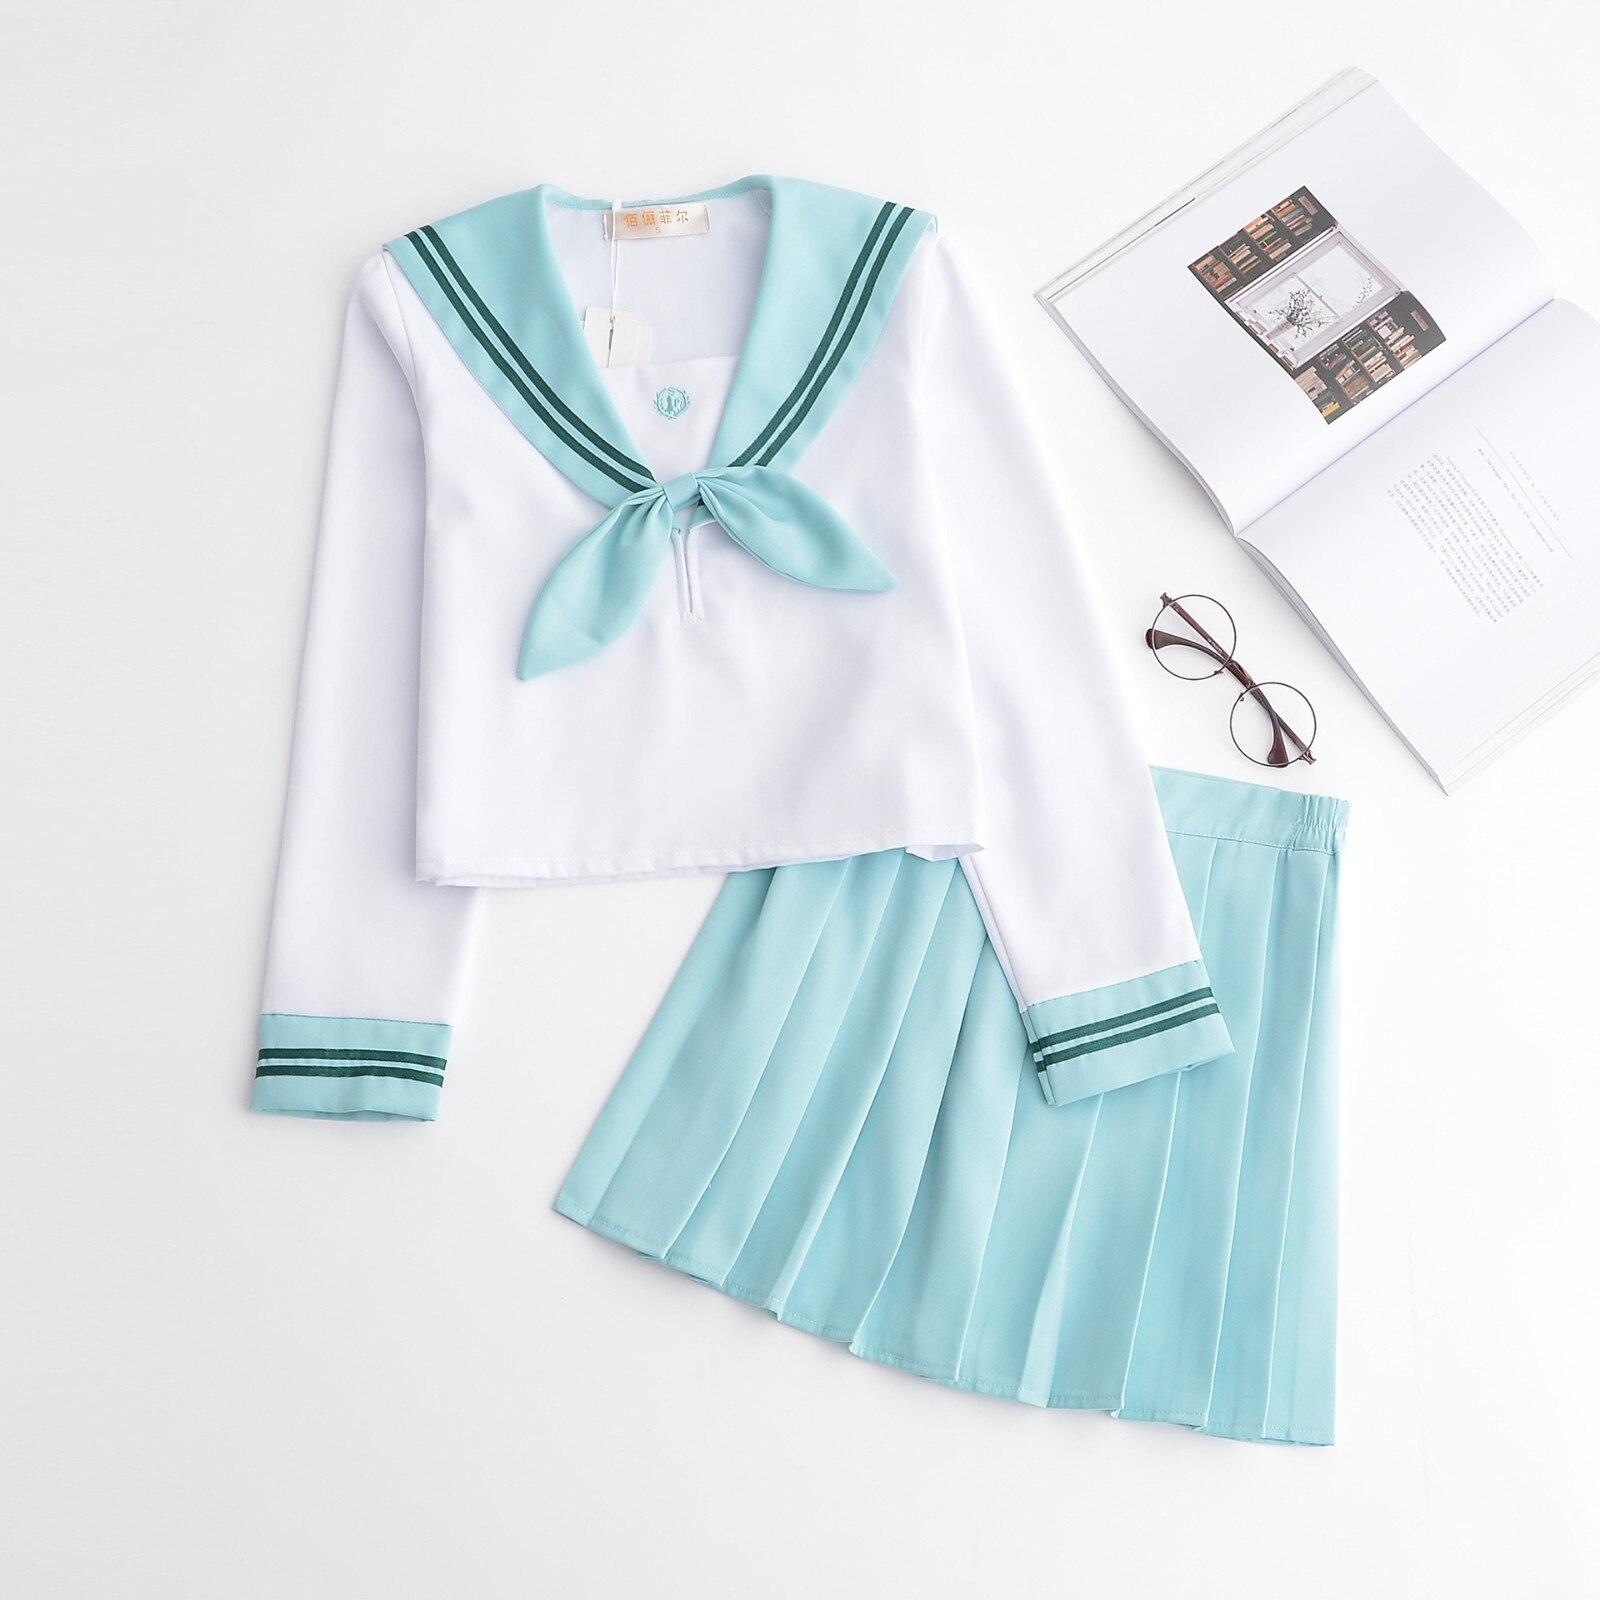 Pink Blue Schoolgirl Uniform Japanese Class Navy Sailor School Uniforms Students Clothes For Girls Anime Cos Sailor Navy Suit